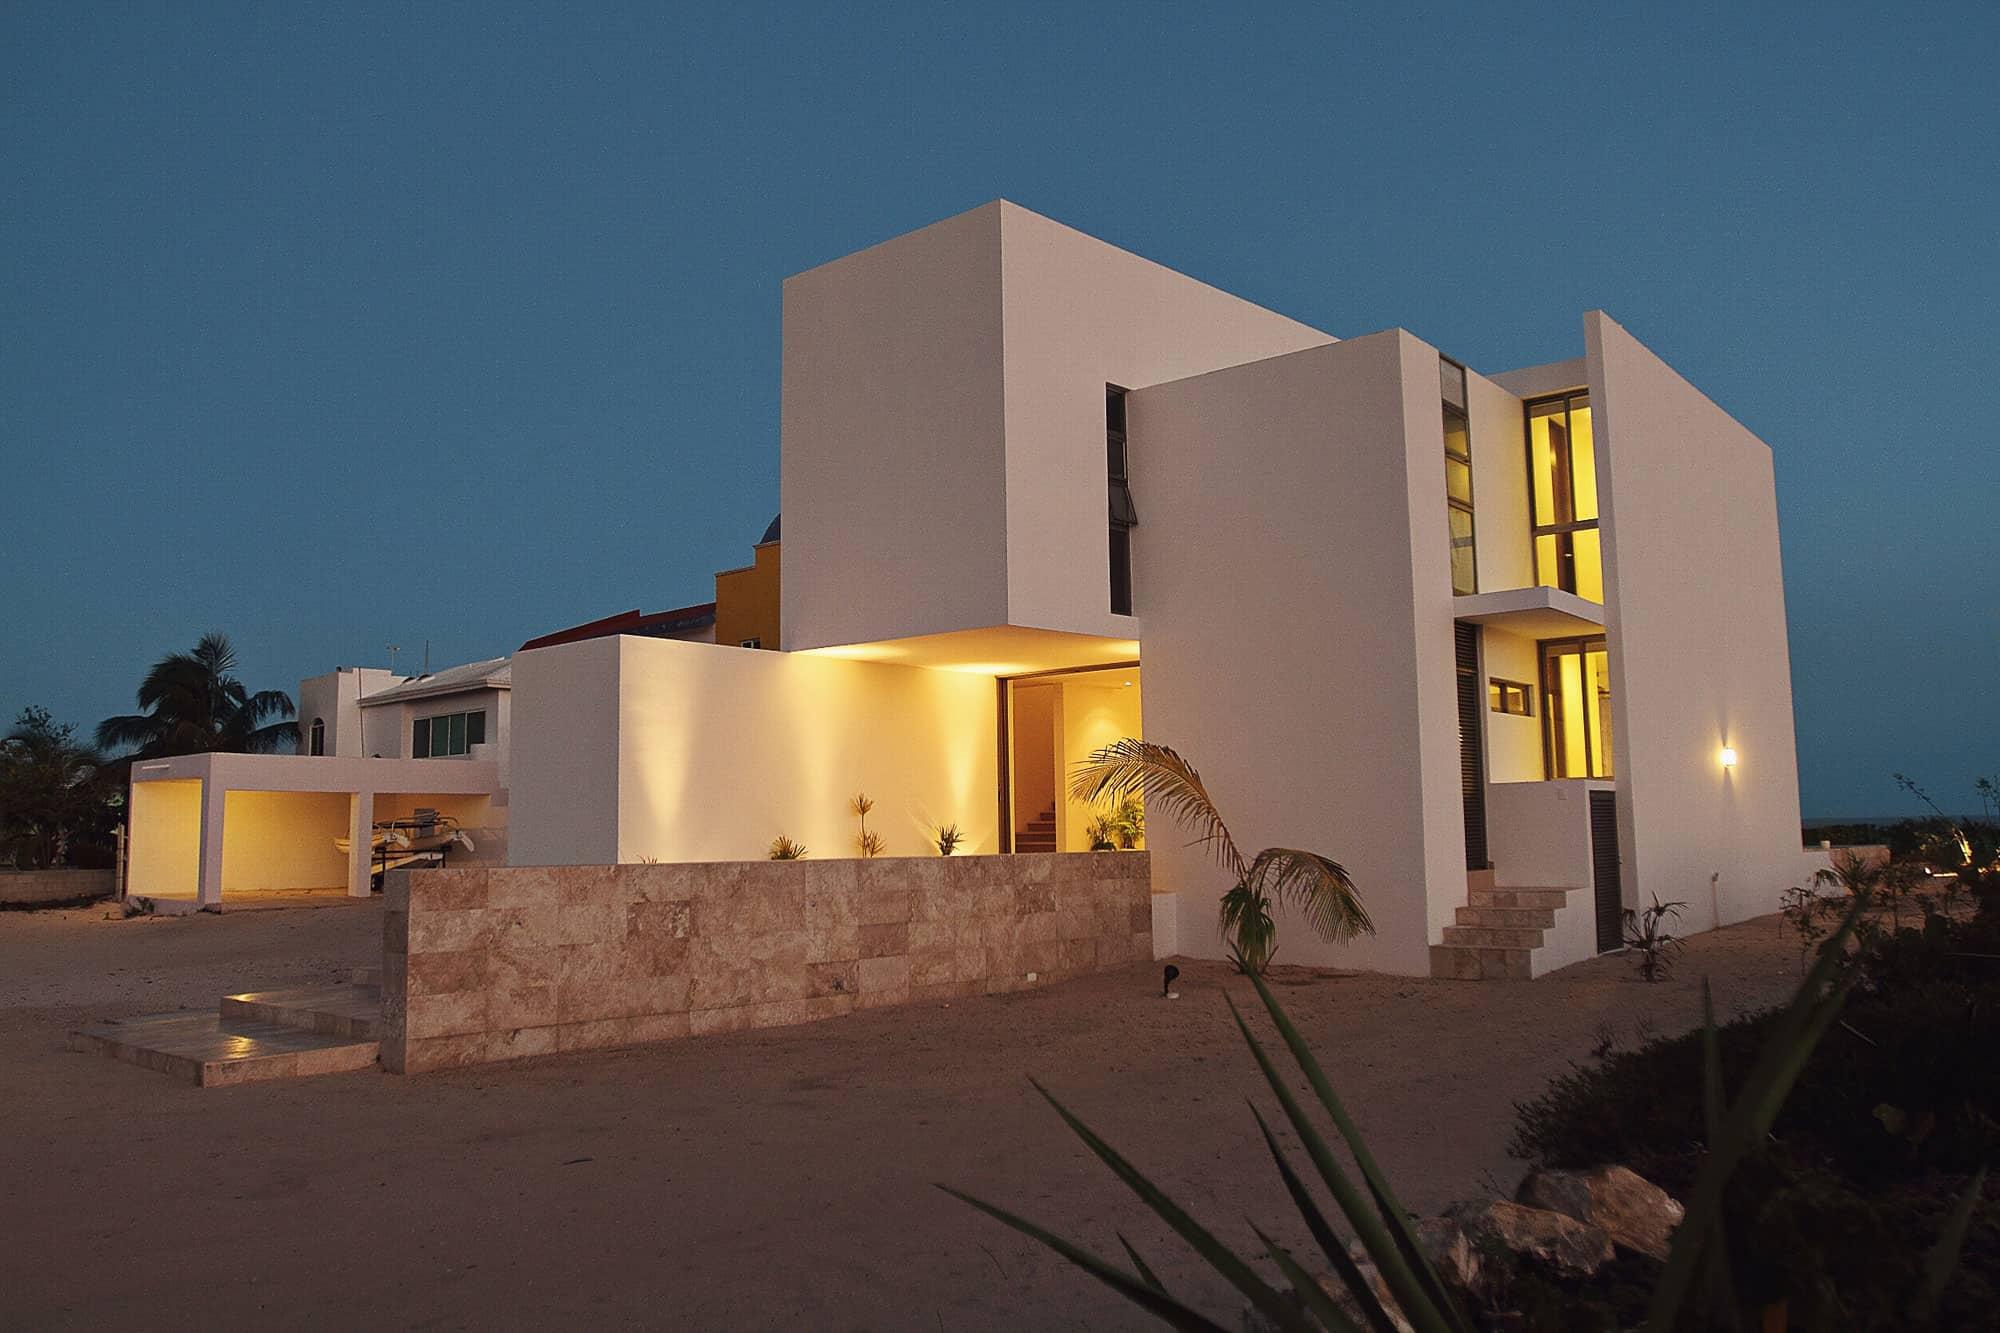 Tuunich Kanab by Seijo Peon Arquitectos (4)